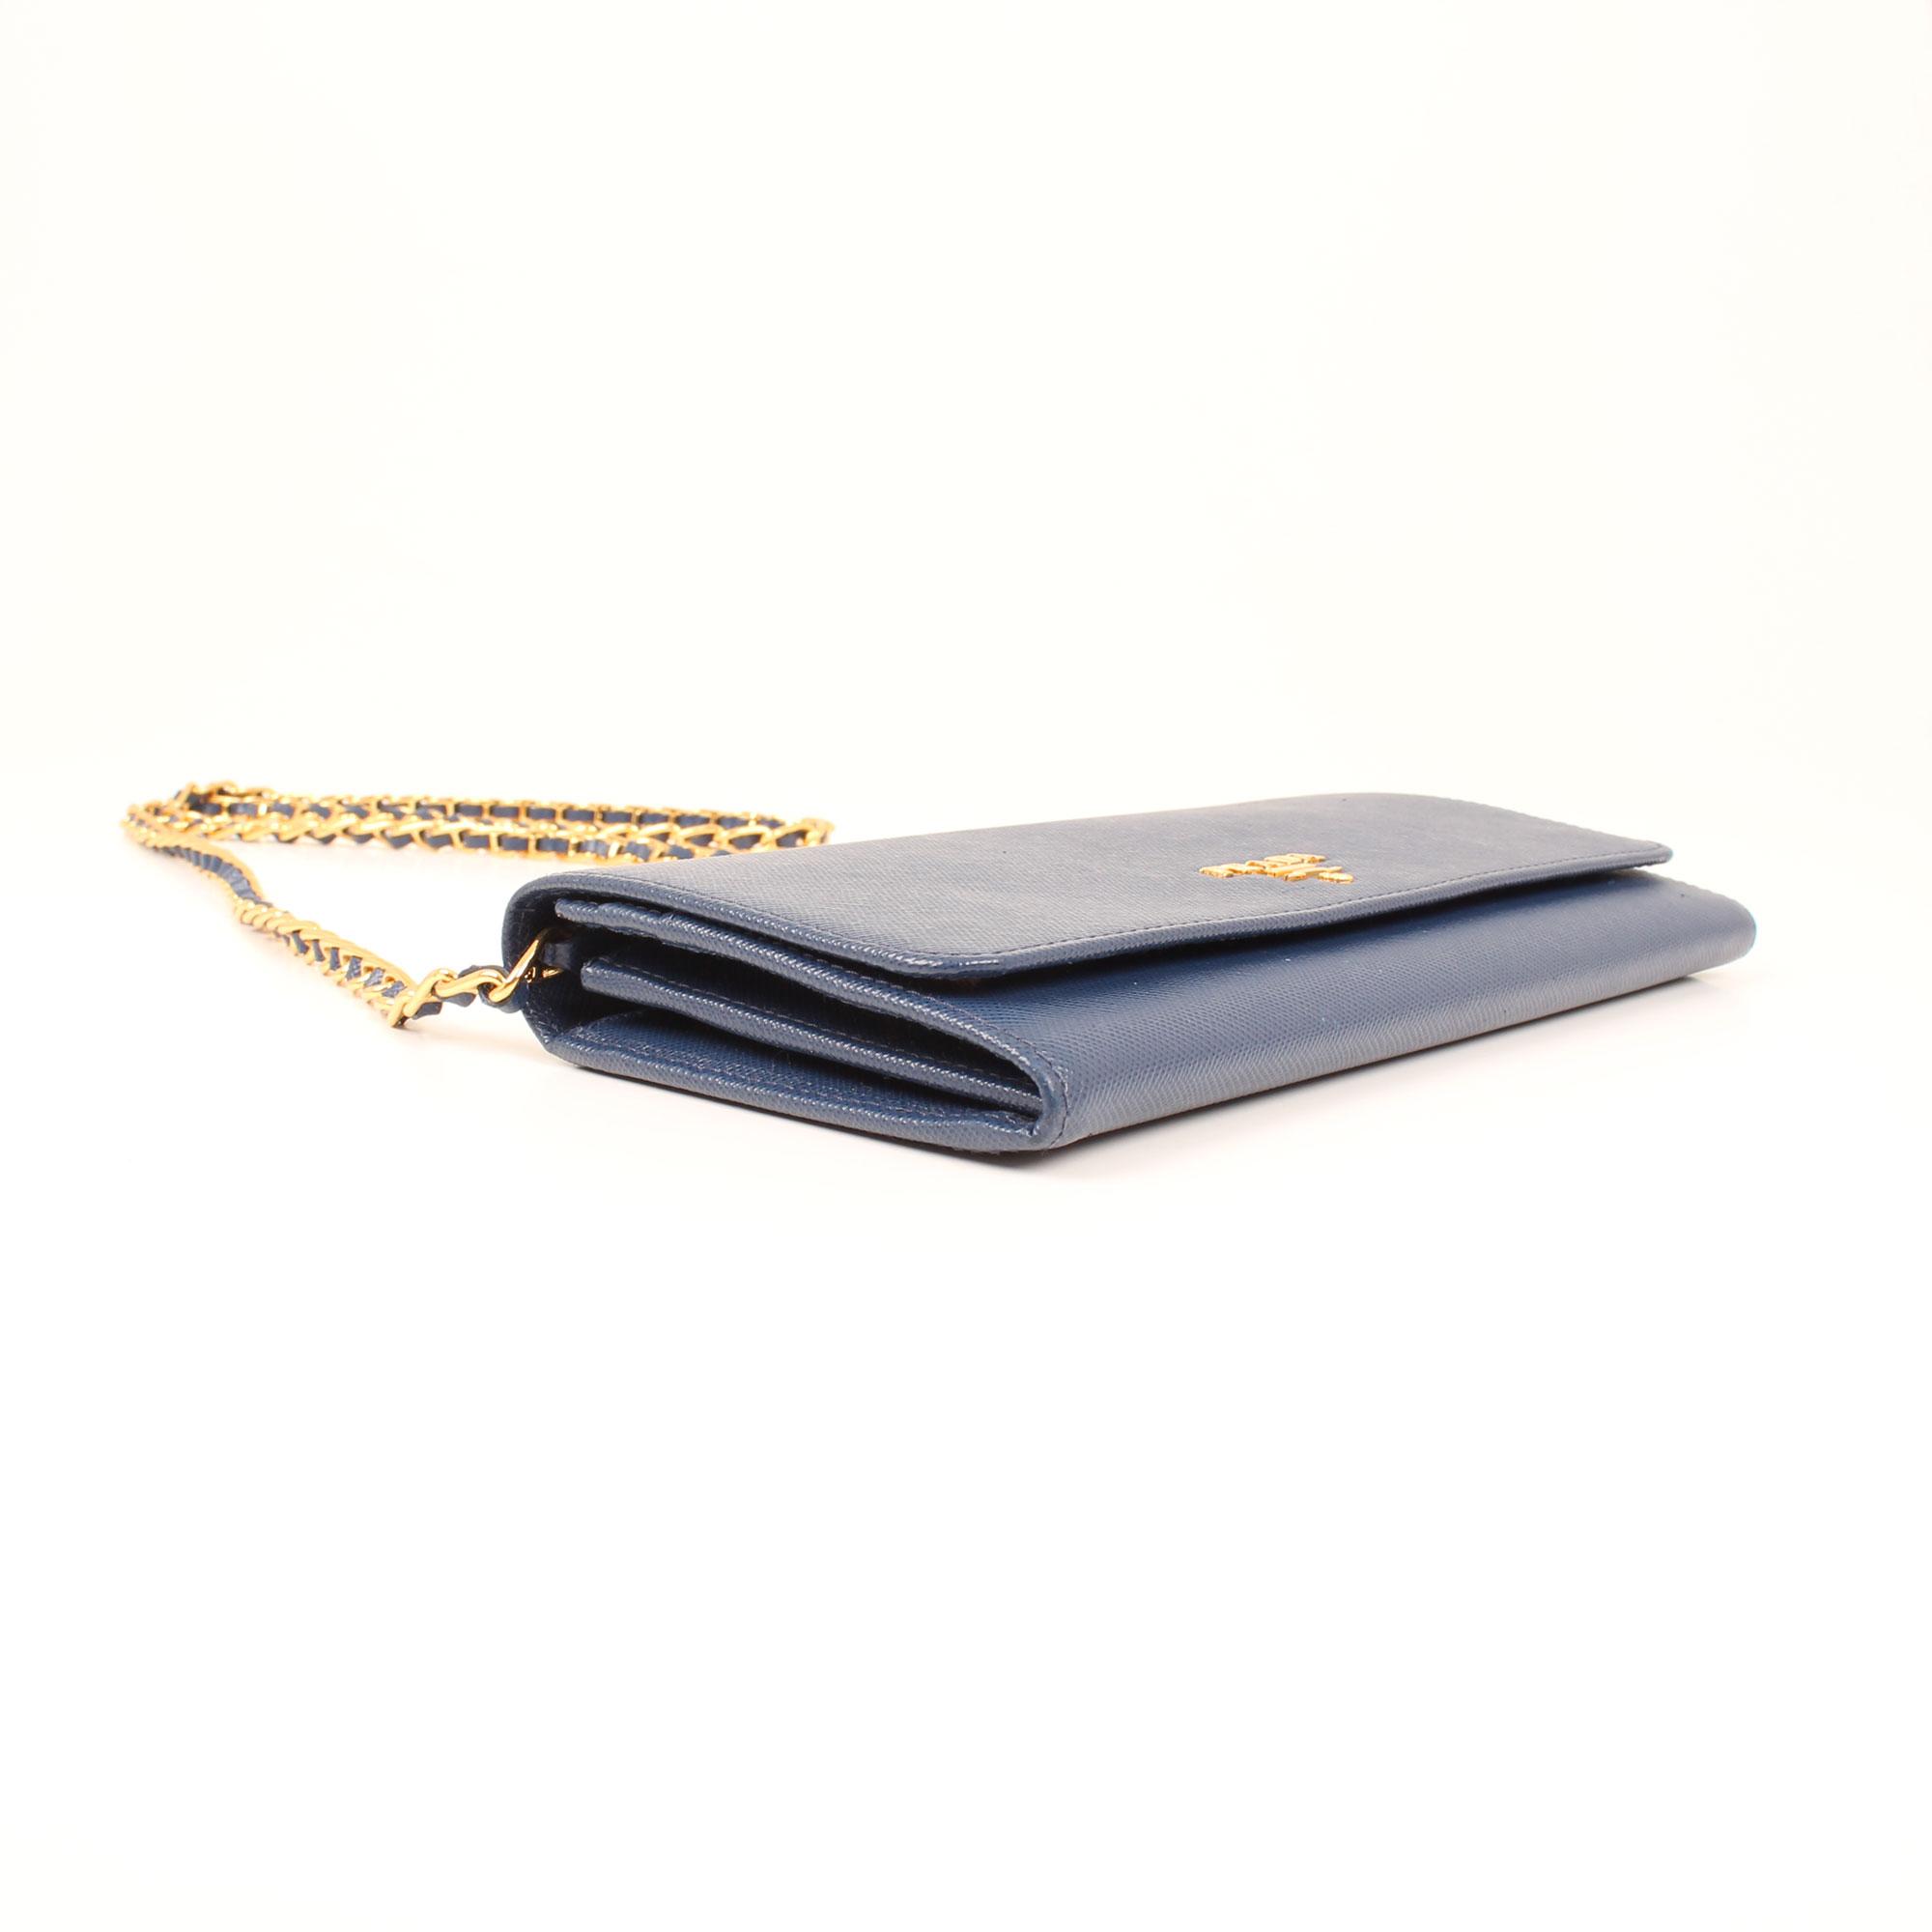 bag-prada-wallet-on-chain-saffiano-metal-bluette-azul-side1